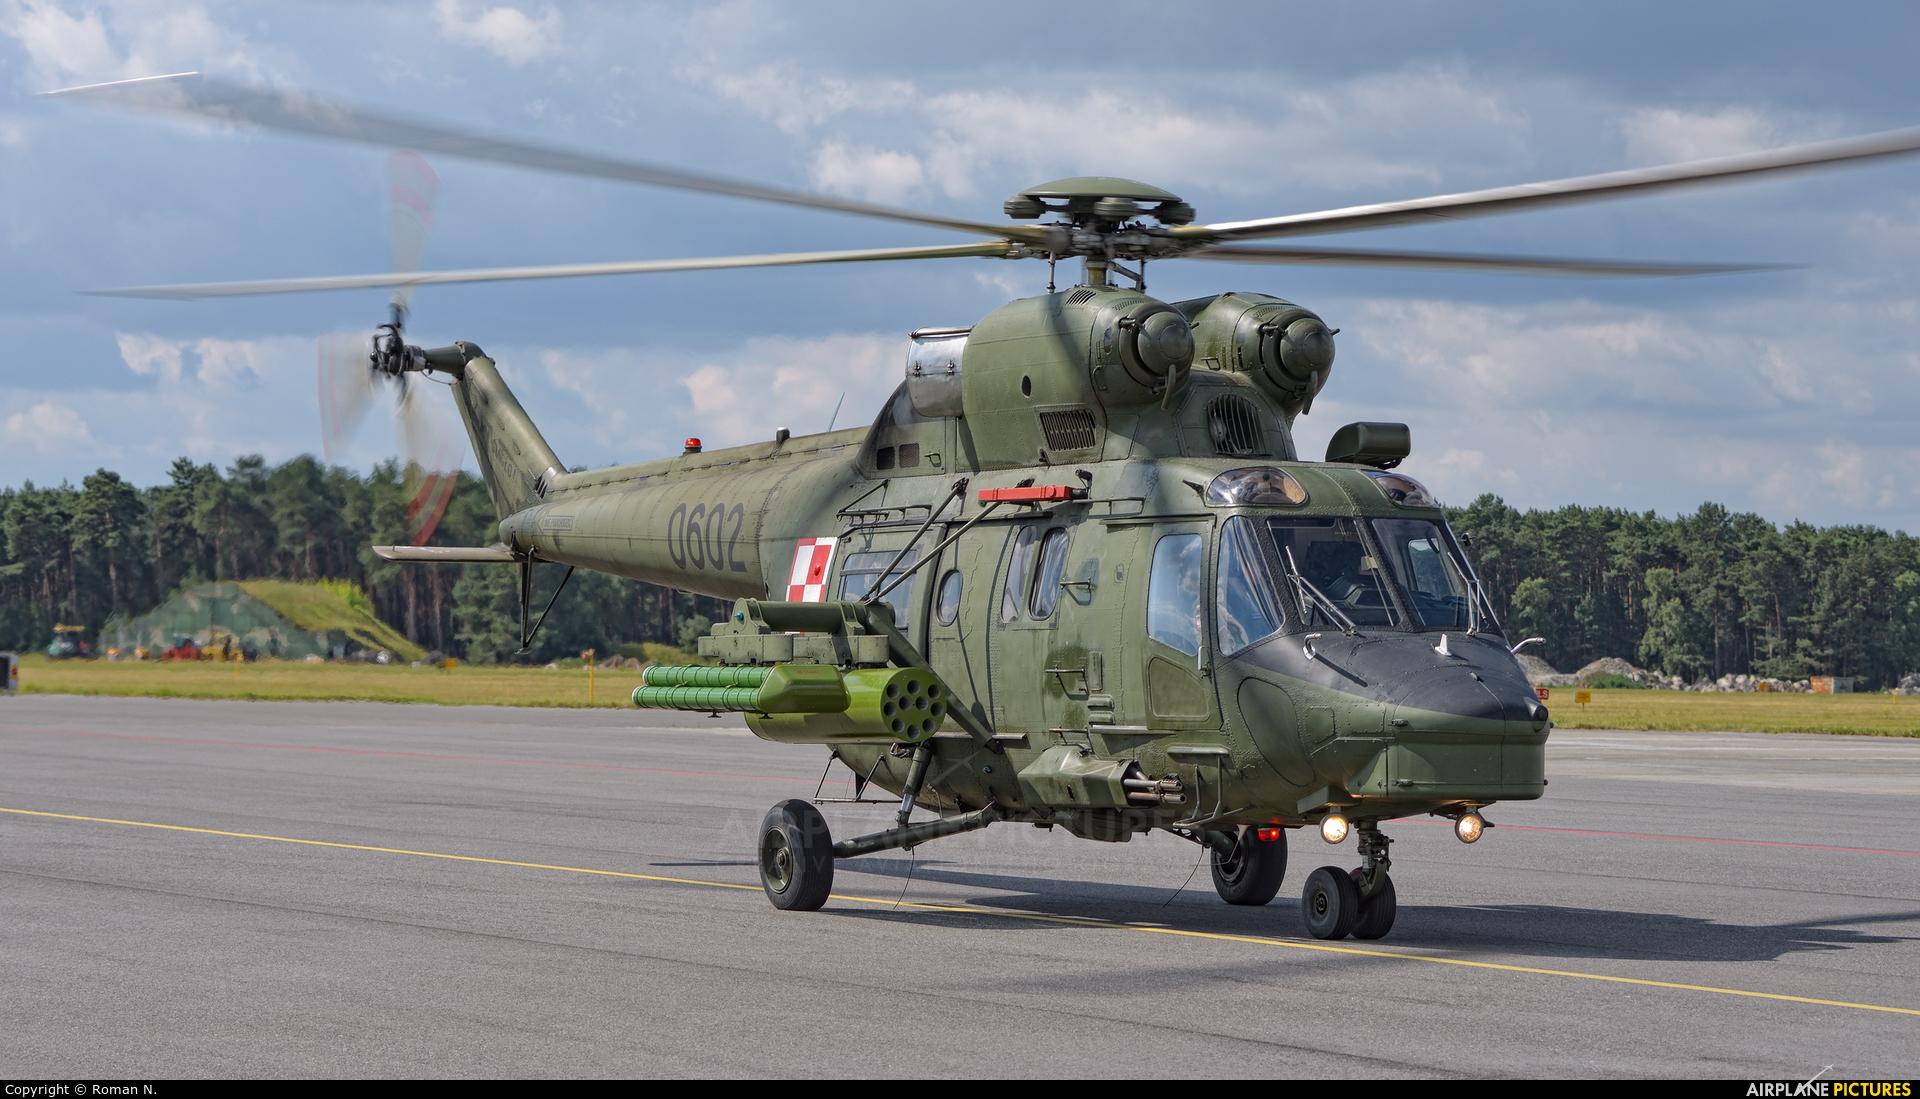 Poland - Air Force 0602 aircraft at Bydgoszcz - Szwederowo